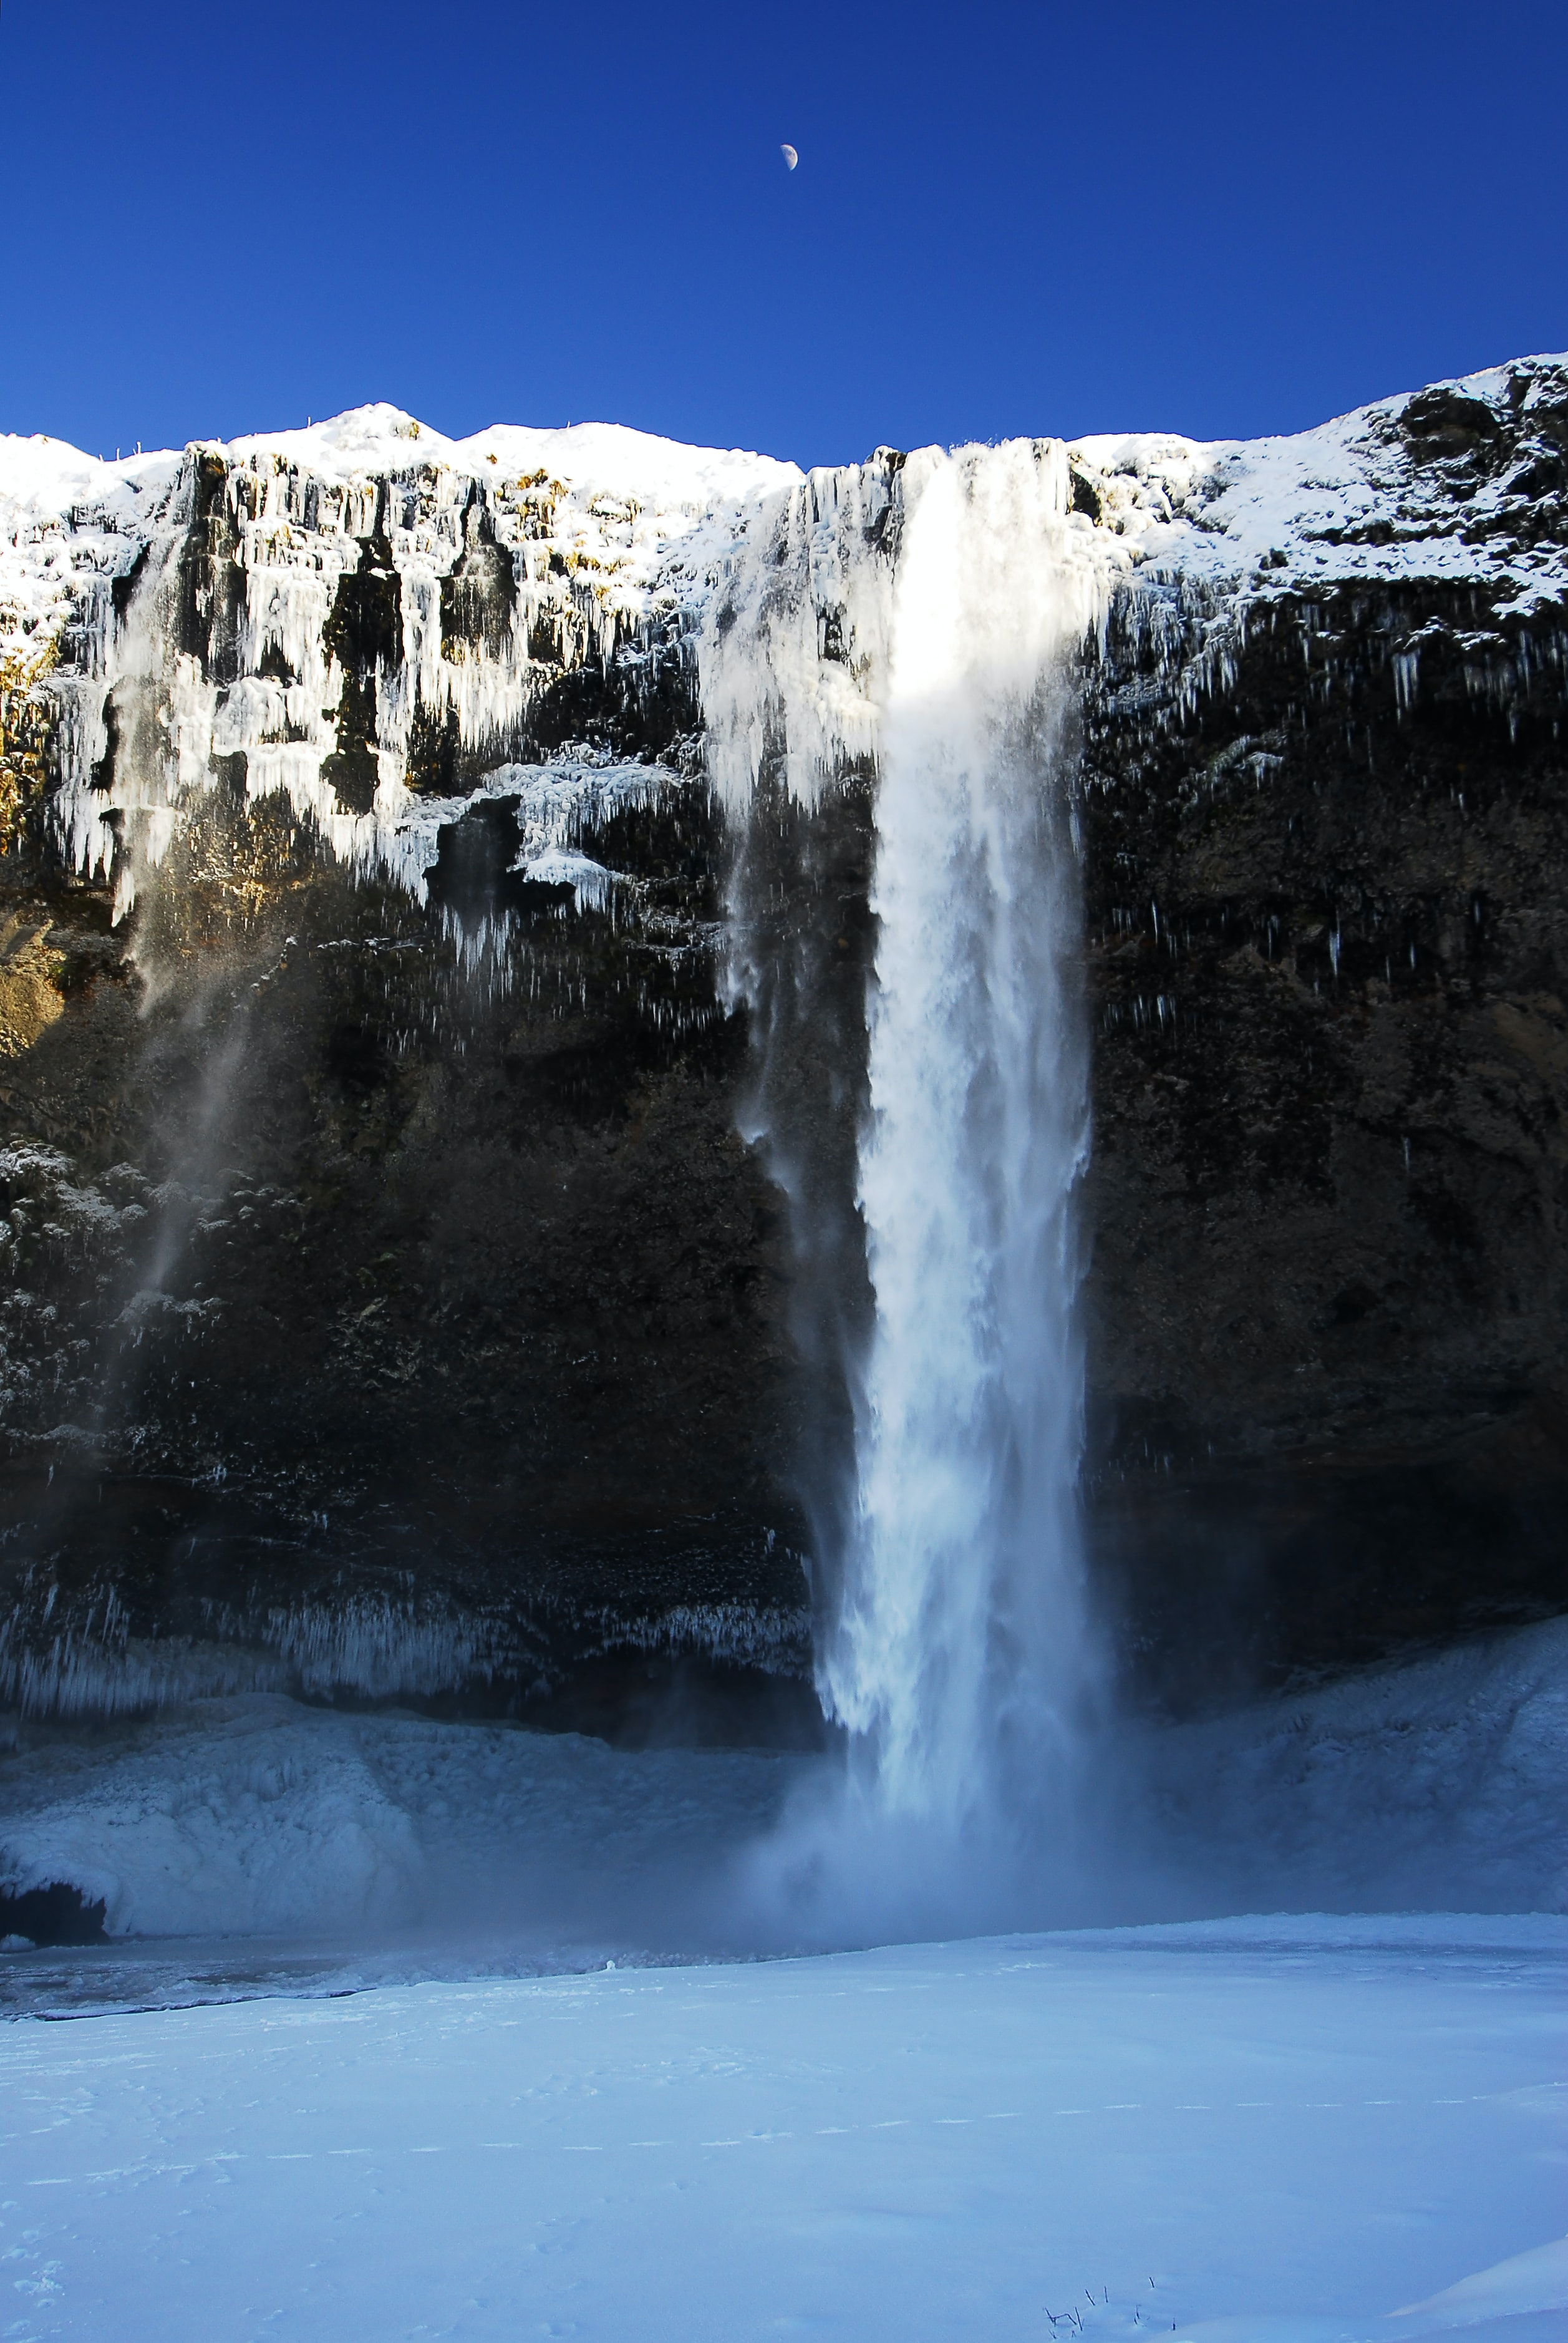 waterfalls on black and white mountain during daytime